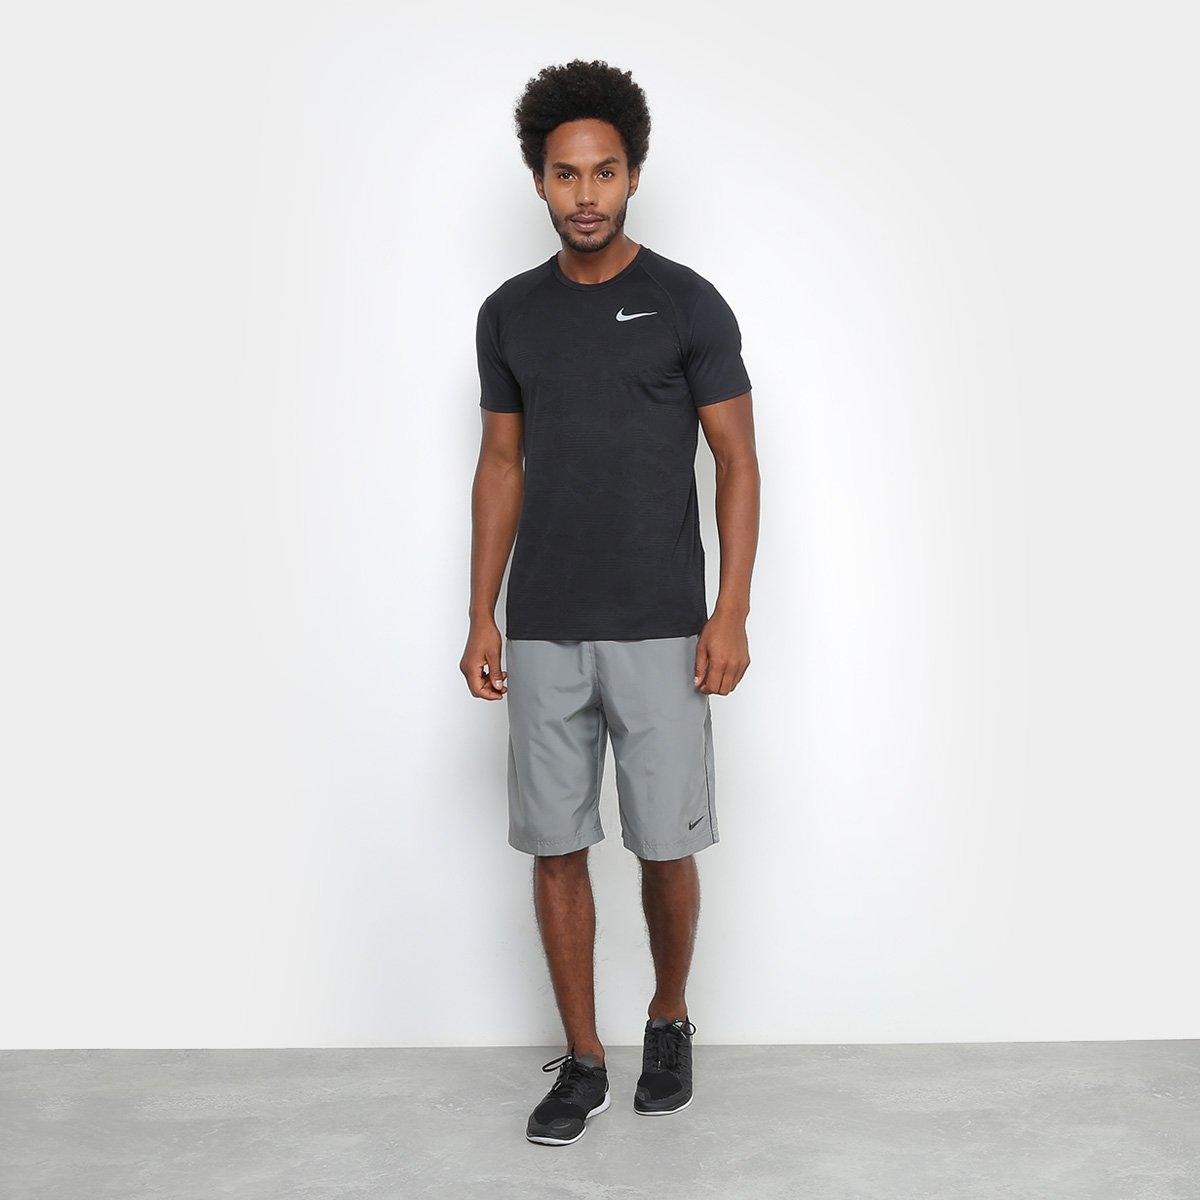 c871e5c9f4 Camiseta Nike Breathe Miler Ss Nv Masculina - Compre Agora